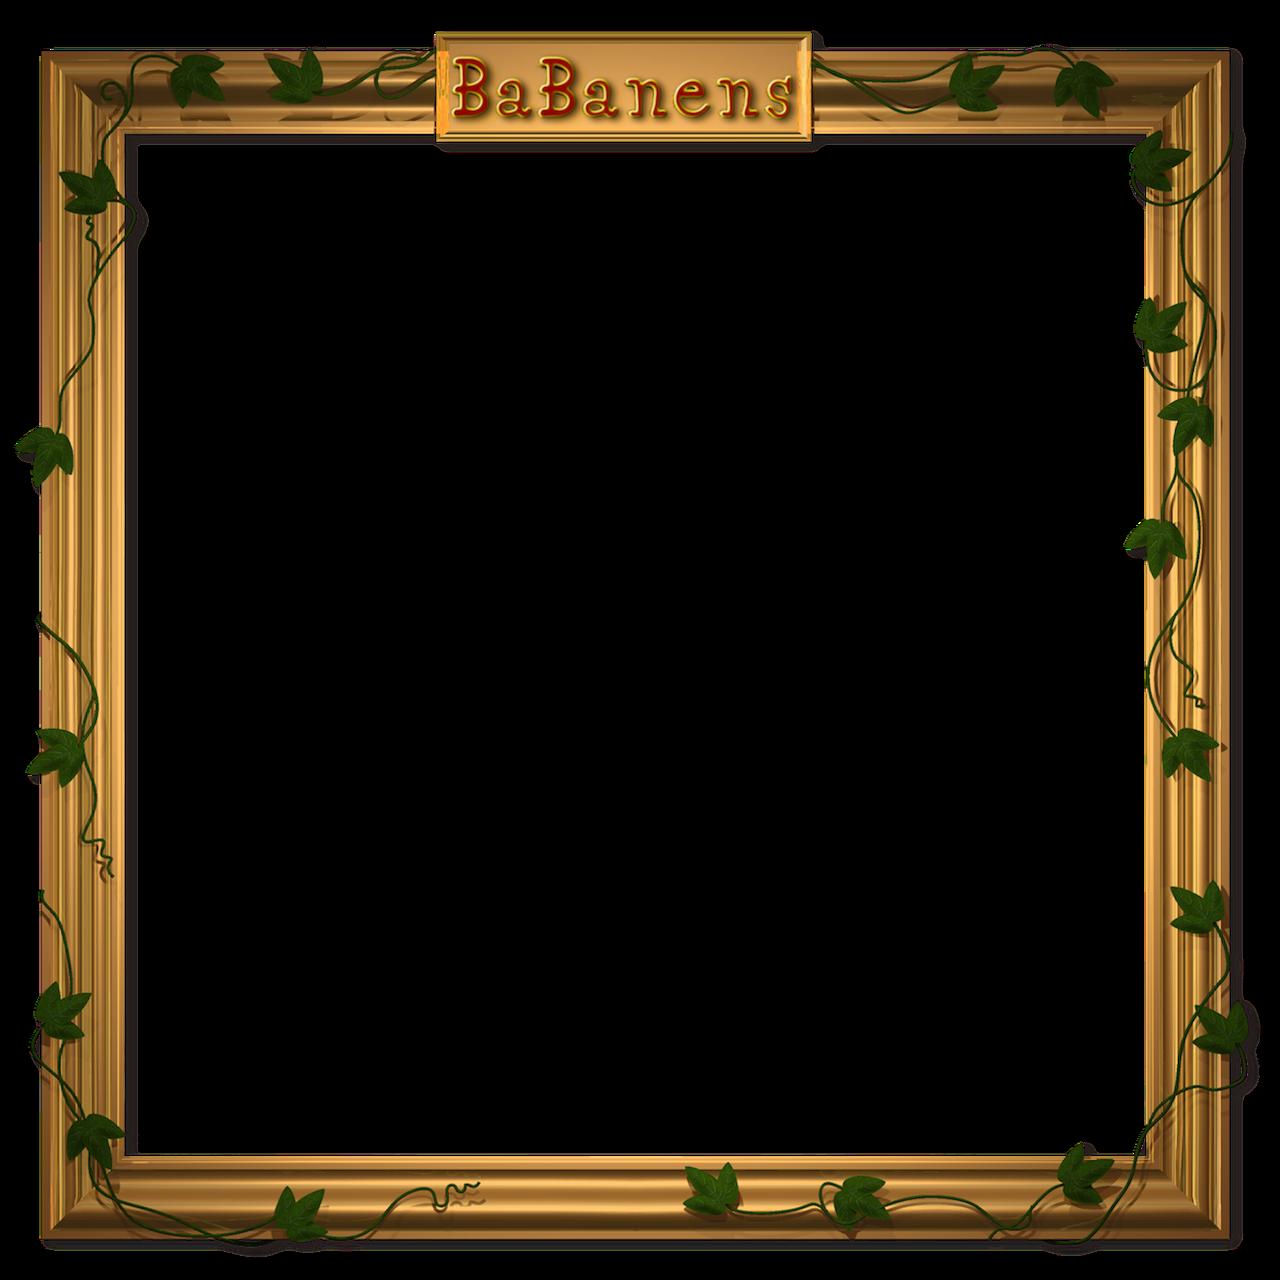 babanens flame